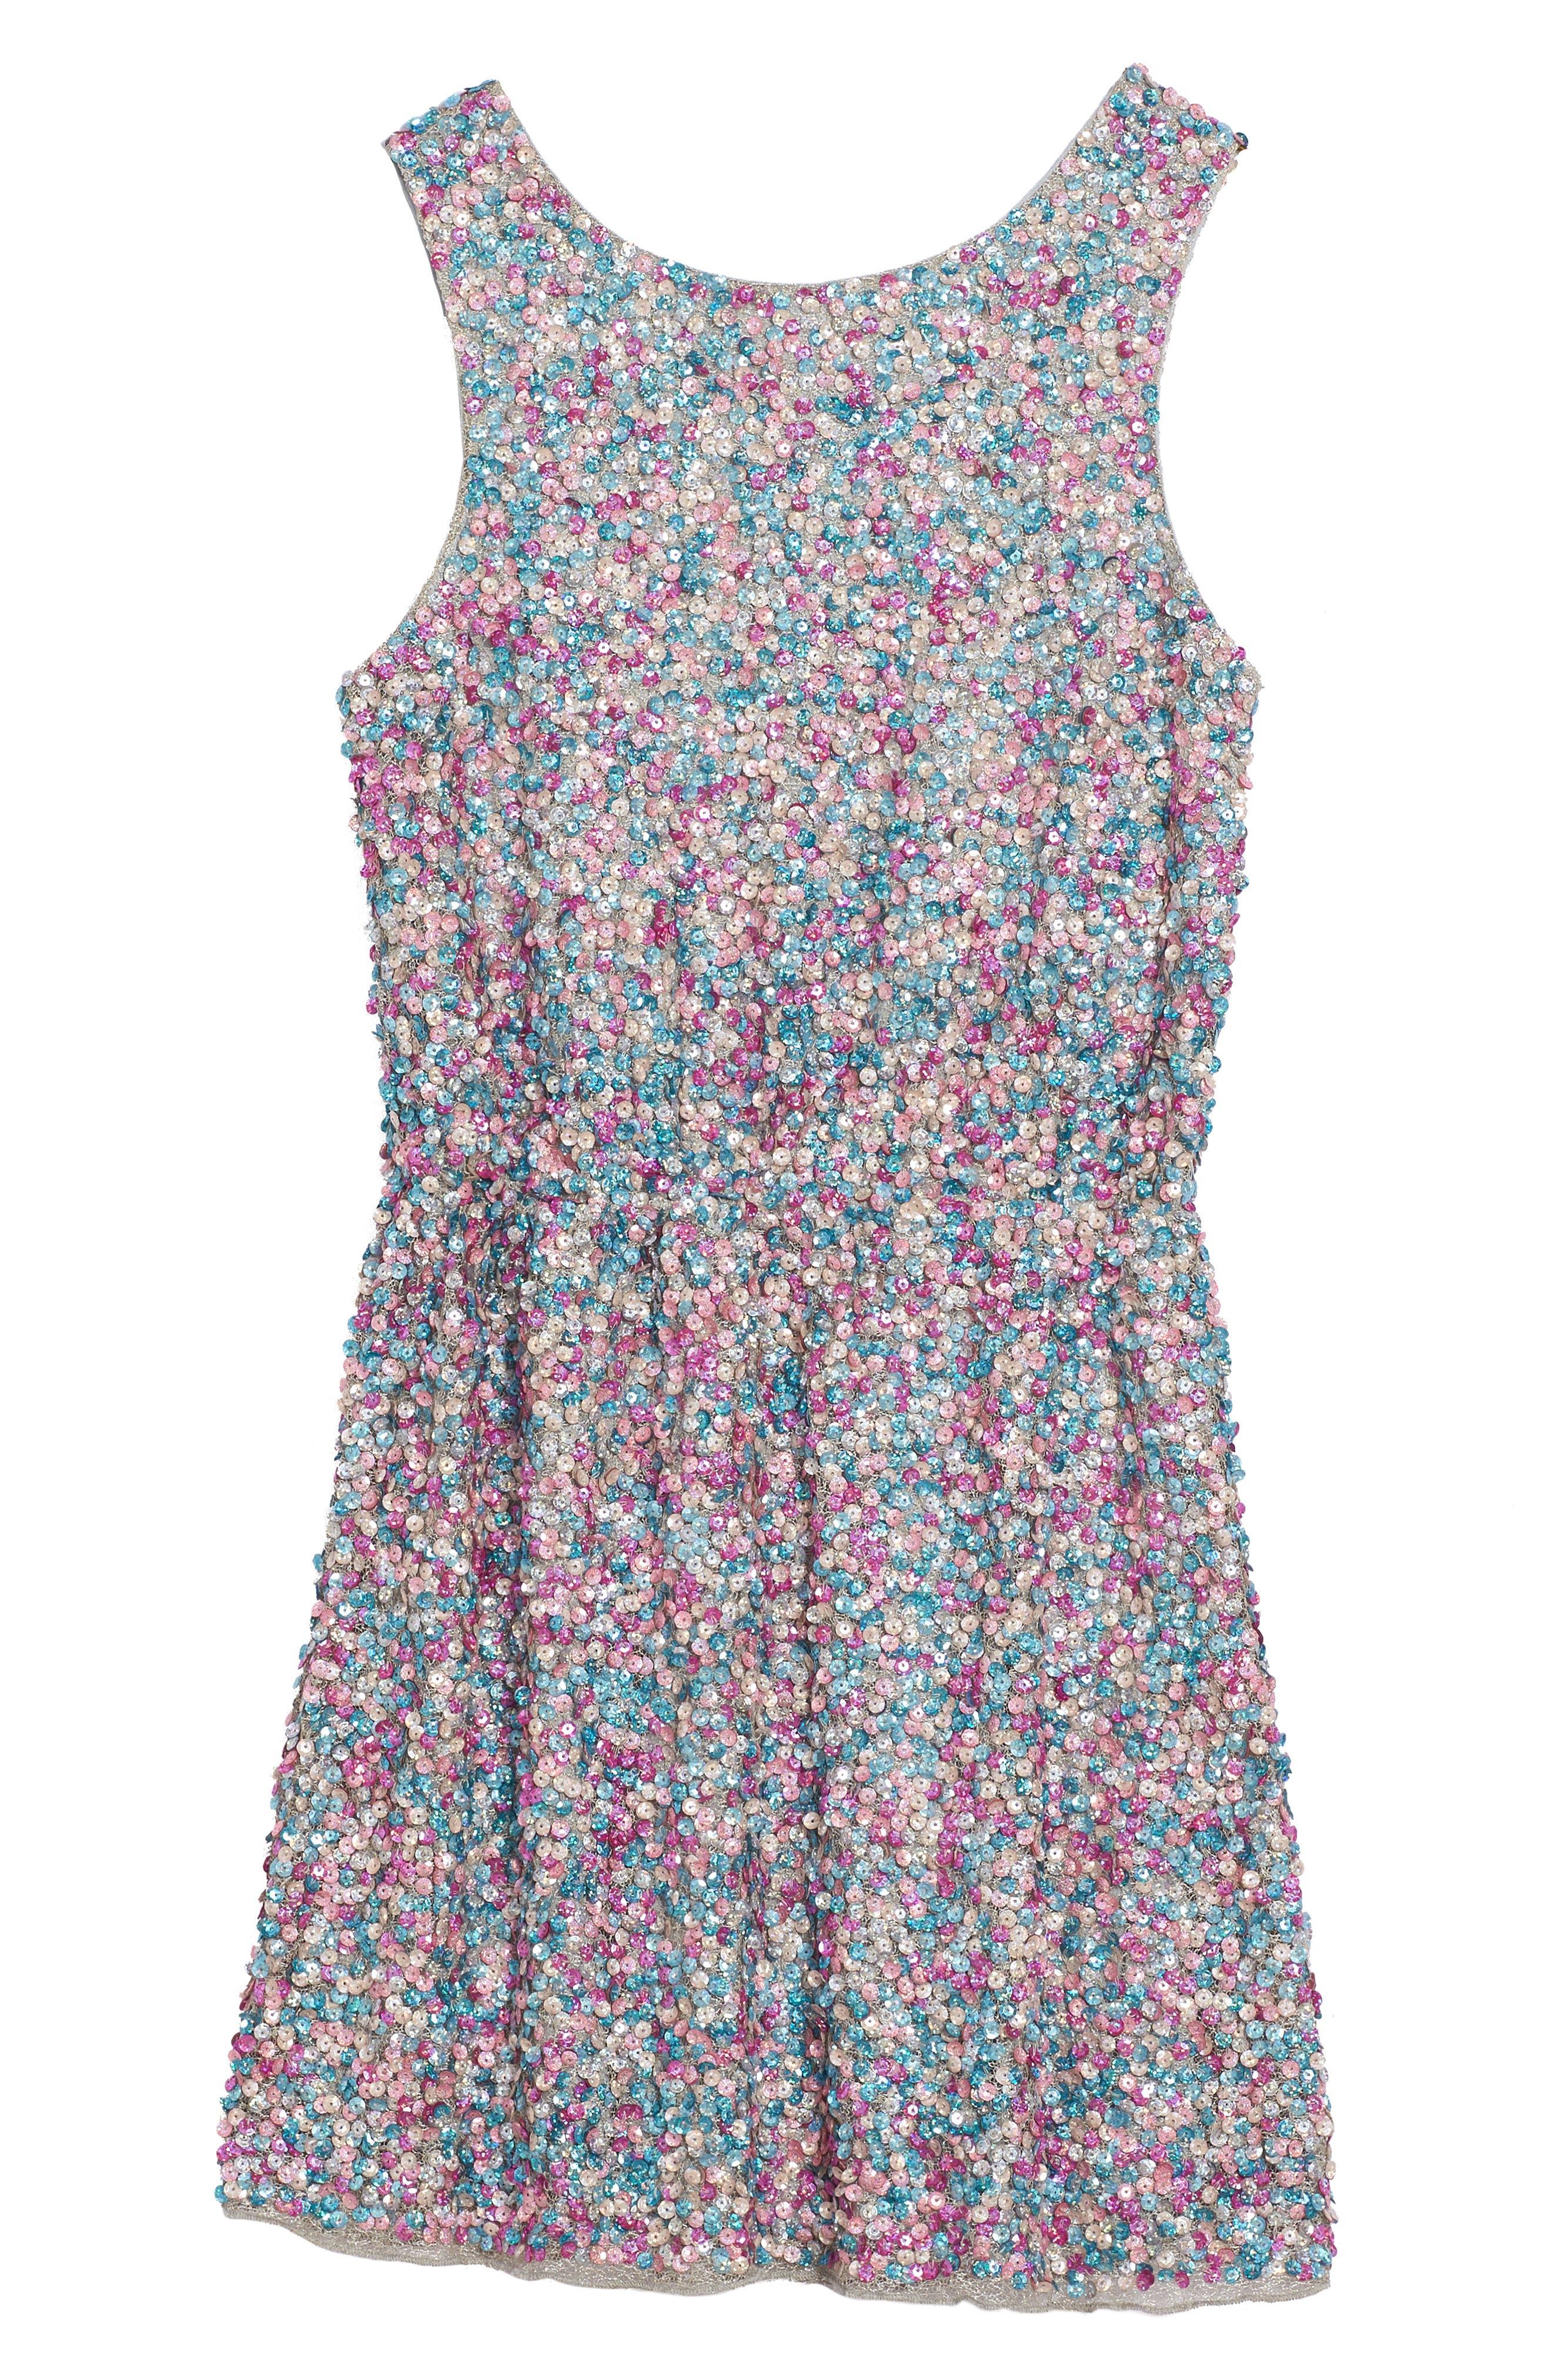 Zoe Sequin Dress,                             Alternate thumbnail 2, color,                             400